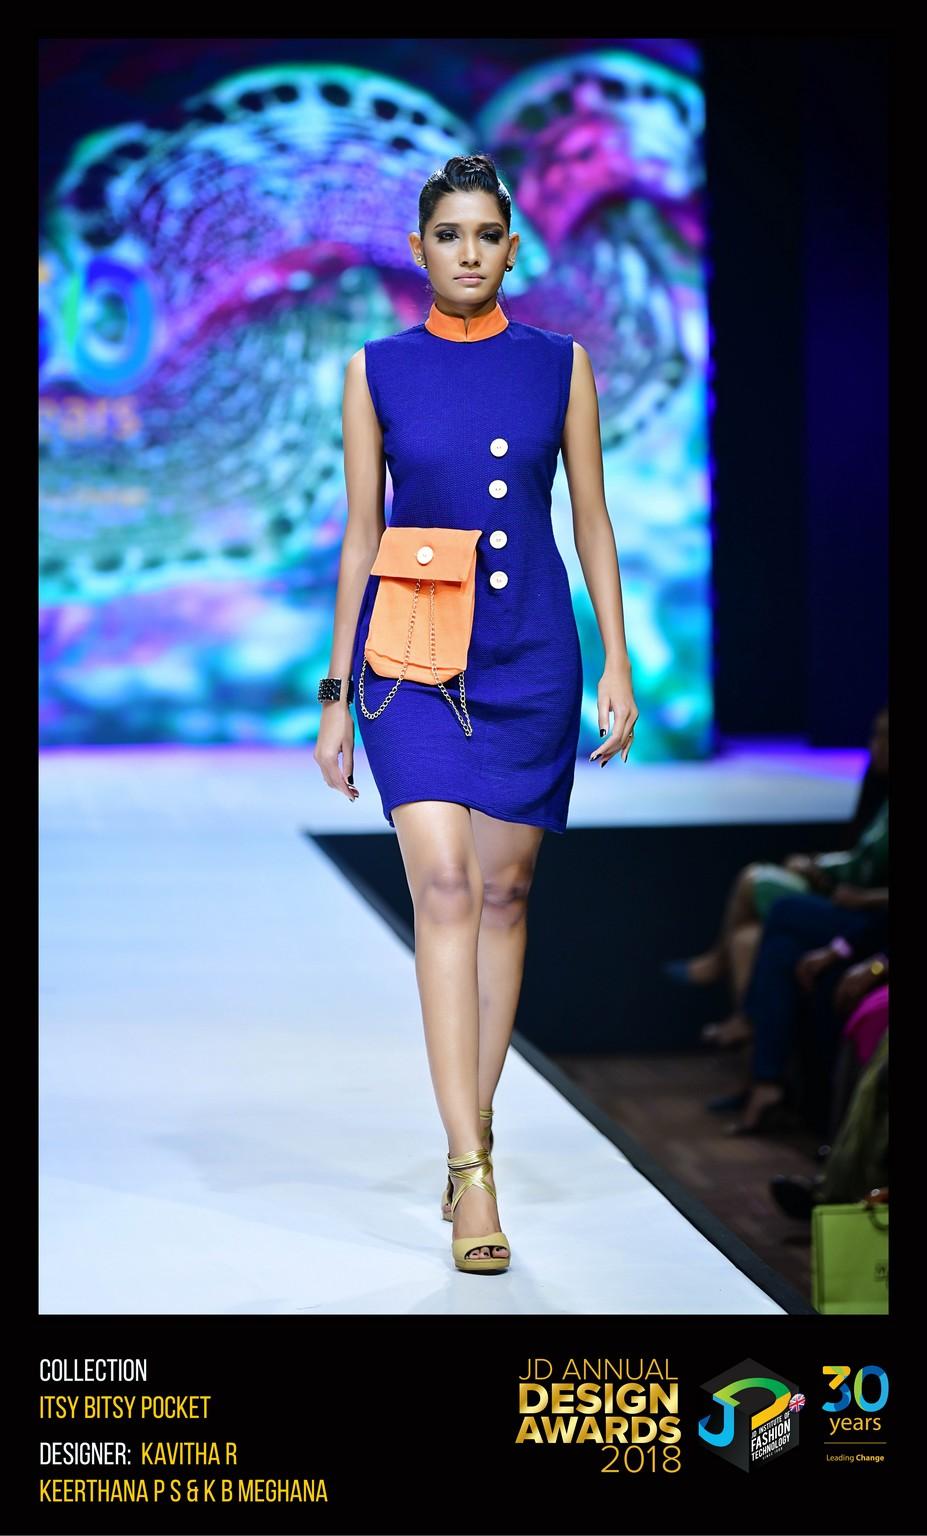 Itsy Bitsy Pocket Dress – Change – JD Annual Design Awards 2018   Designer: Kavitha, Keertana and Meghana   Photography : Jerin Nath (@jerin_nath) itsy bitsy pocket dress - ITSY BITSY POCKET6 - Itsy Bitsy Pocket Dress – Change – JD Annual Design Awards 2018